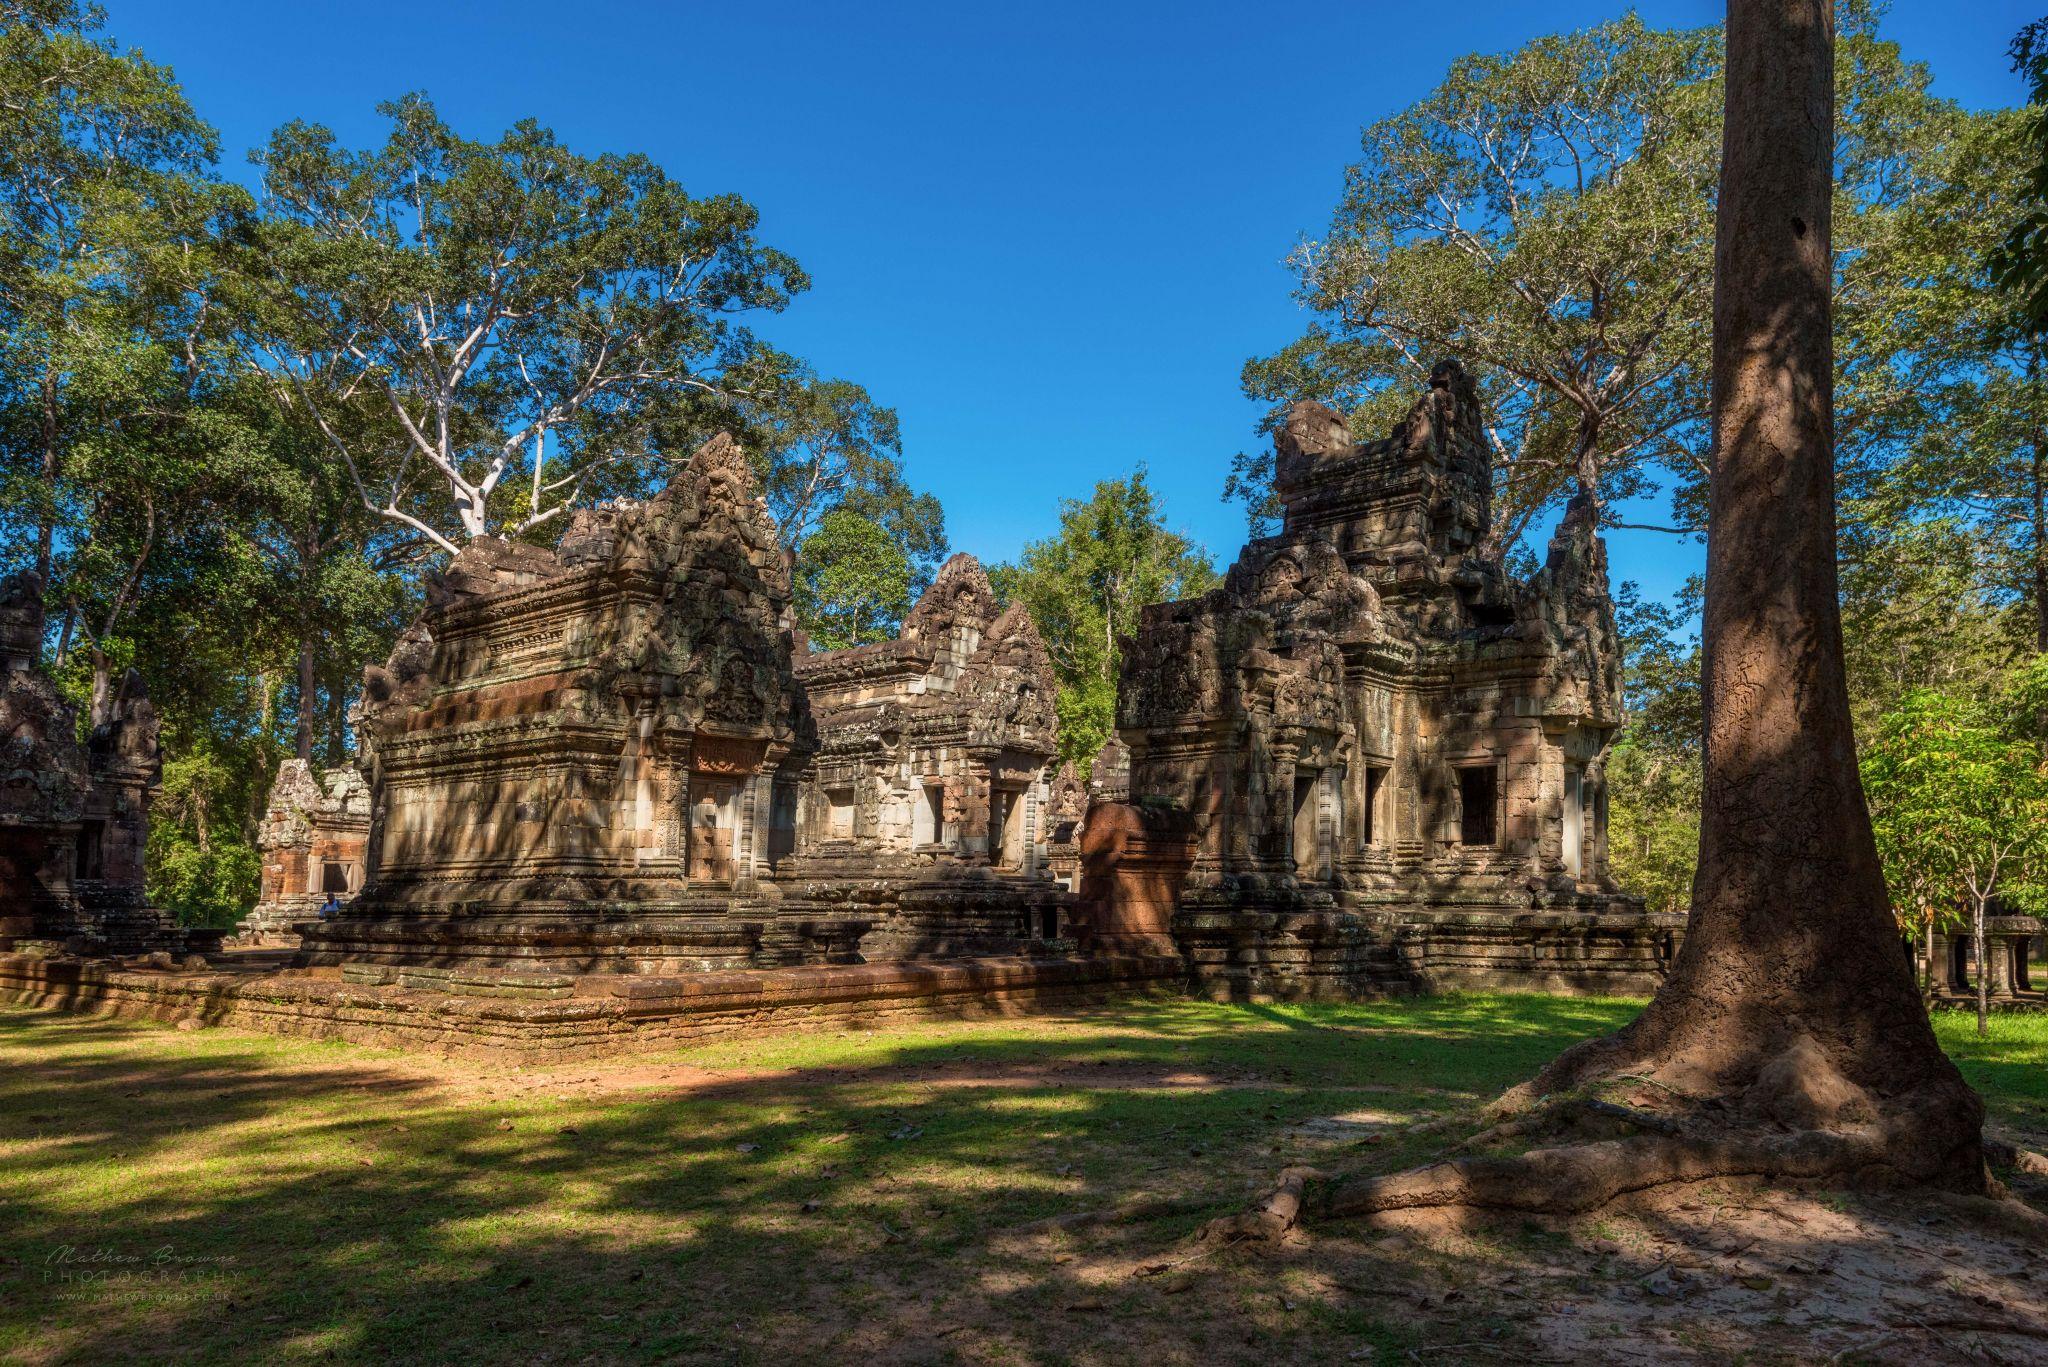 Chau Say Tevoda, Cambodia